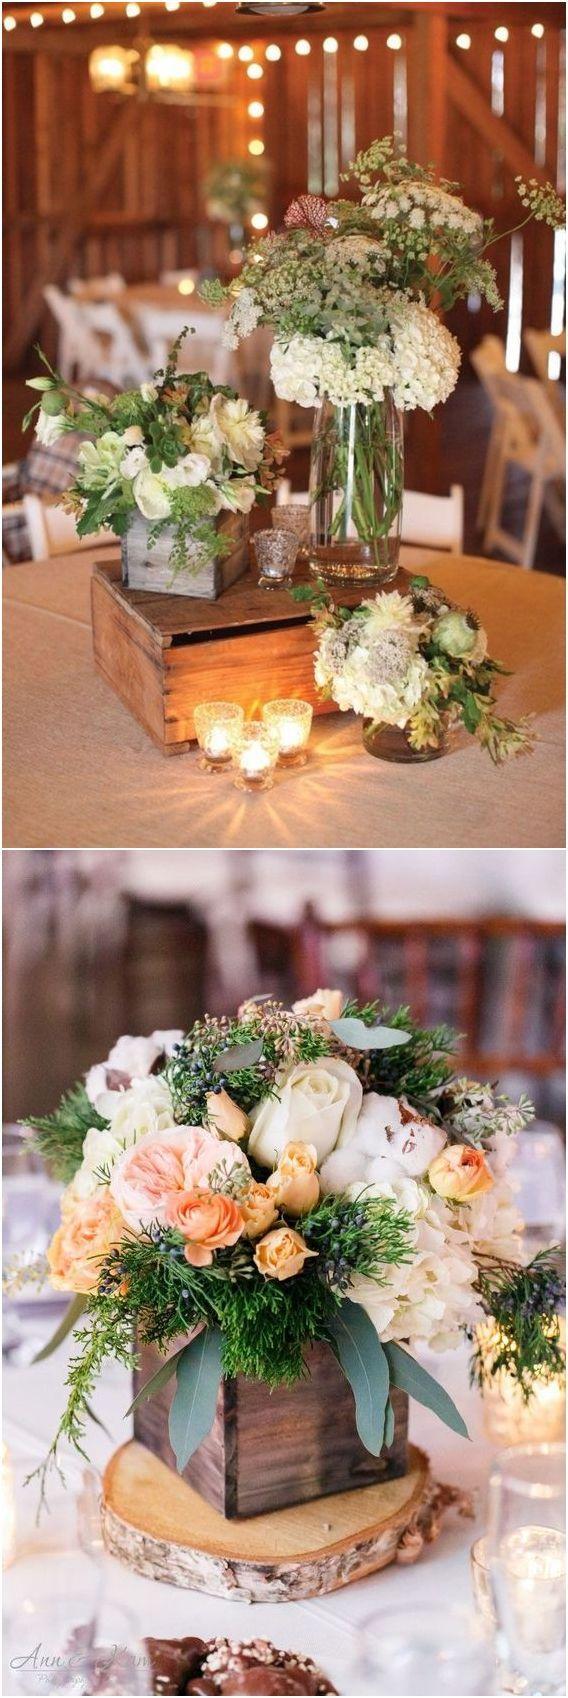 Hochzeit - Rustic Woodsy Wedding Trend 2018: Wooden Crates